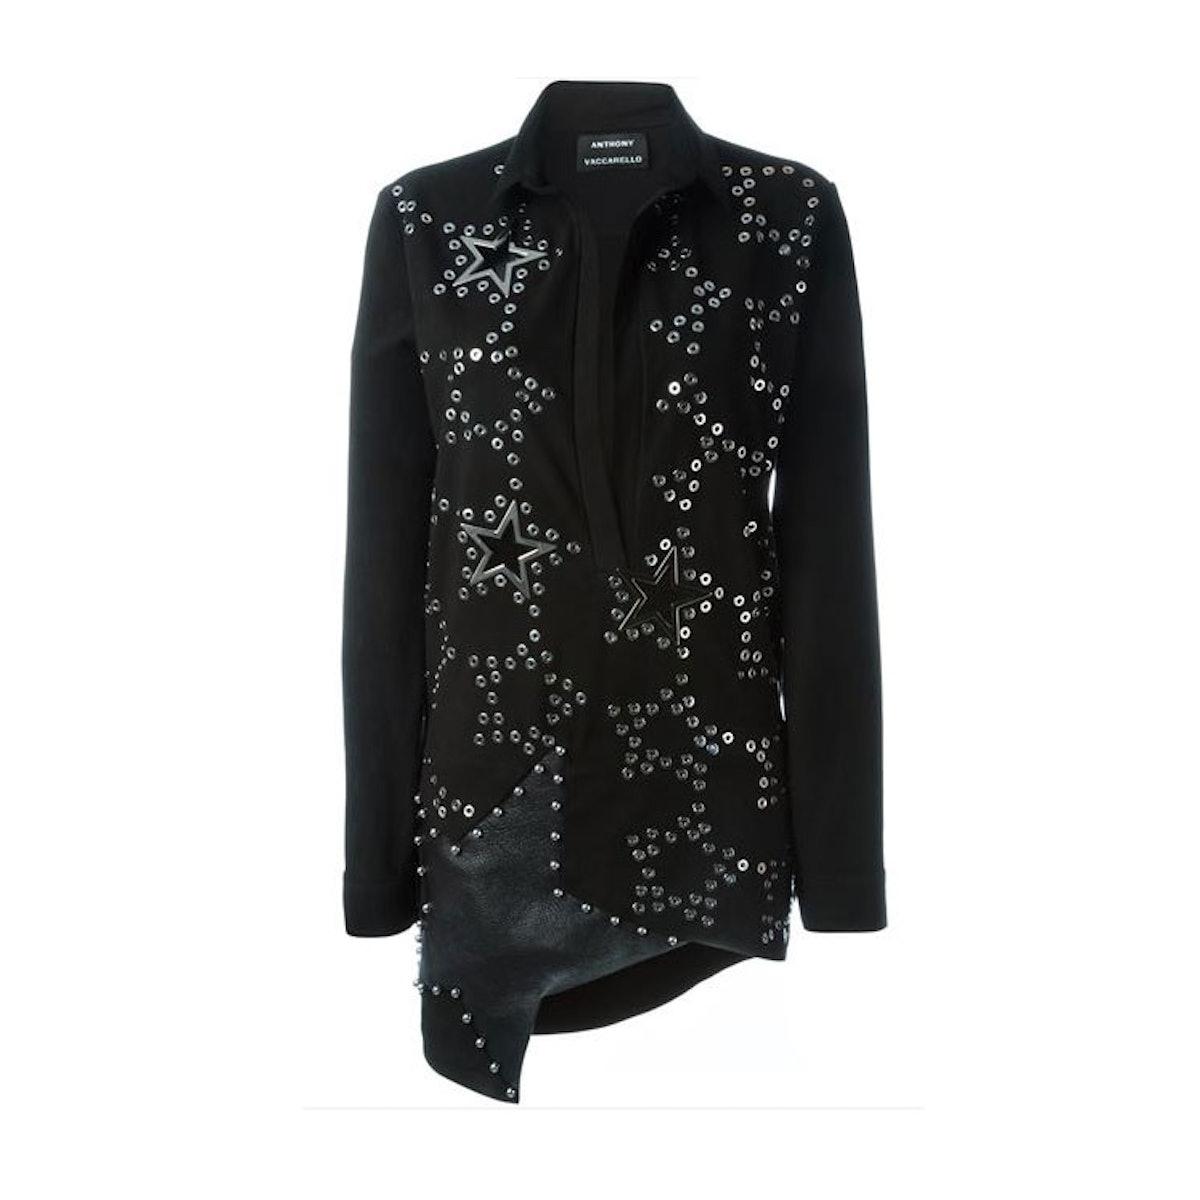 Anthony Vaccarello dress